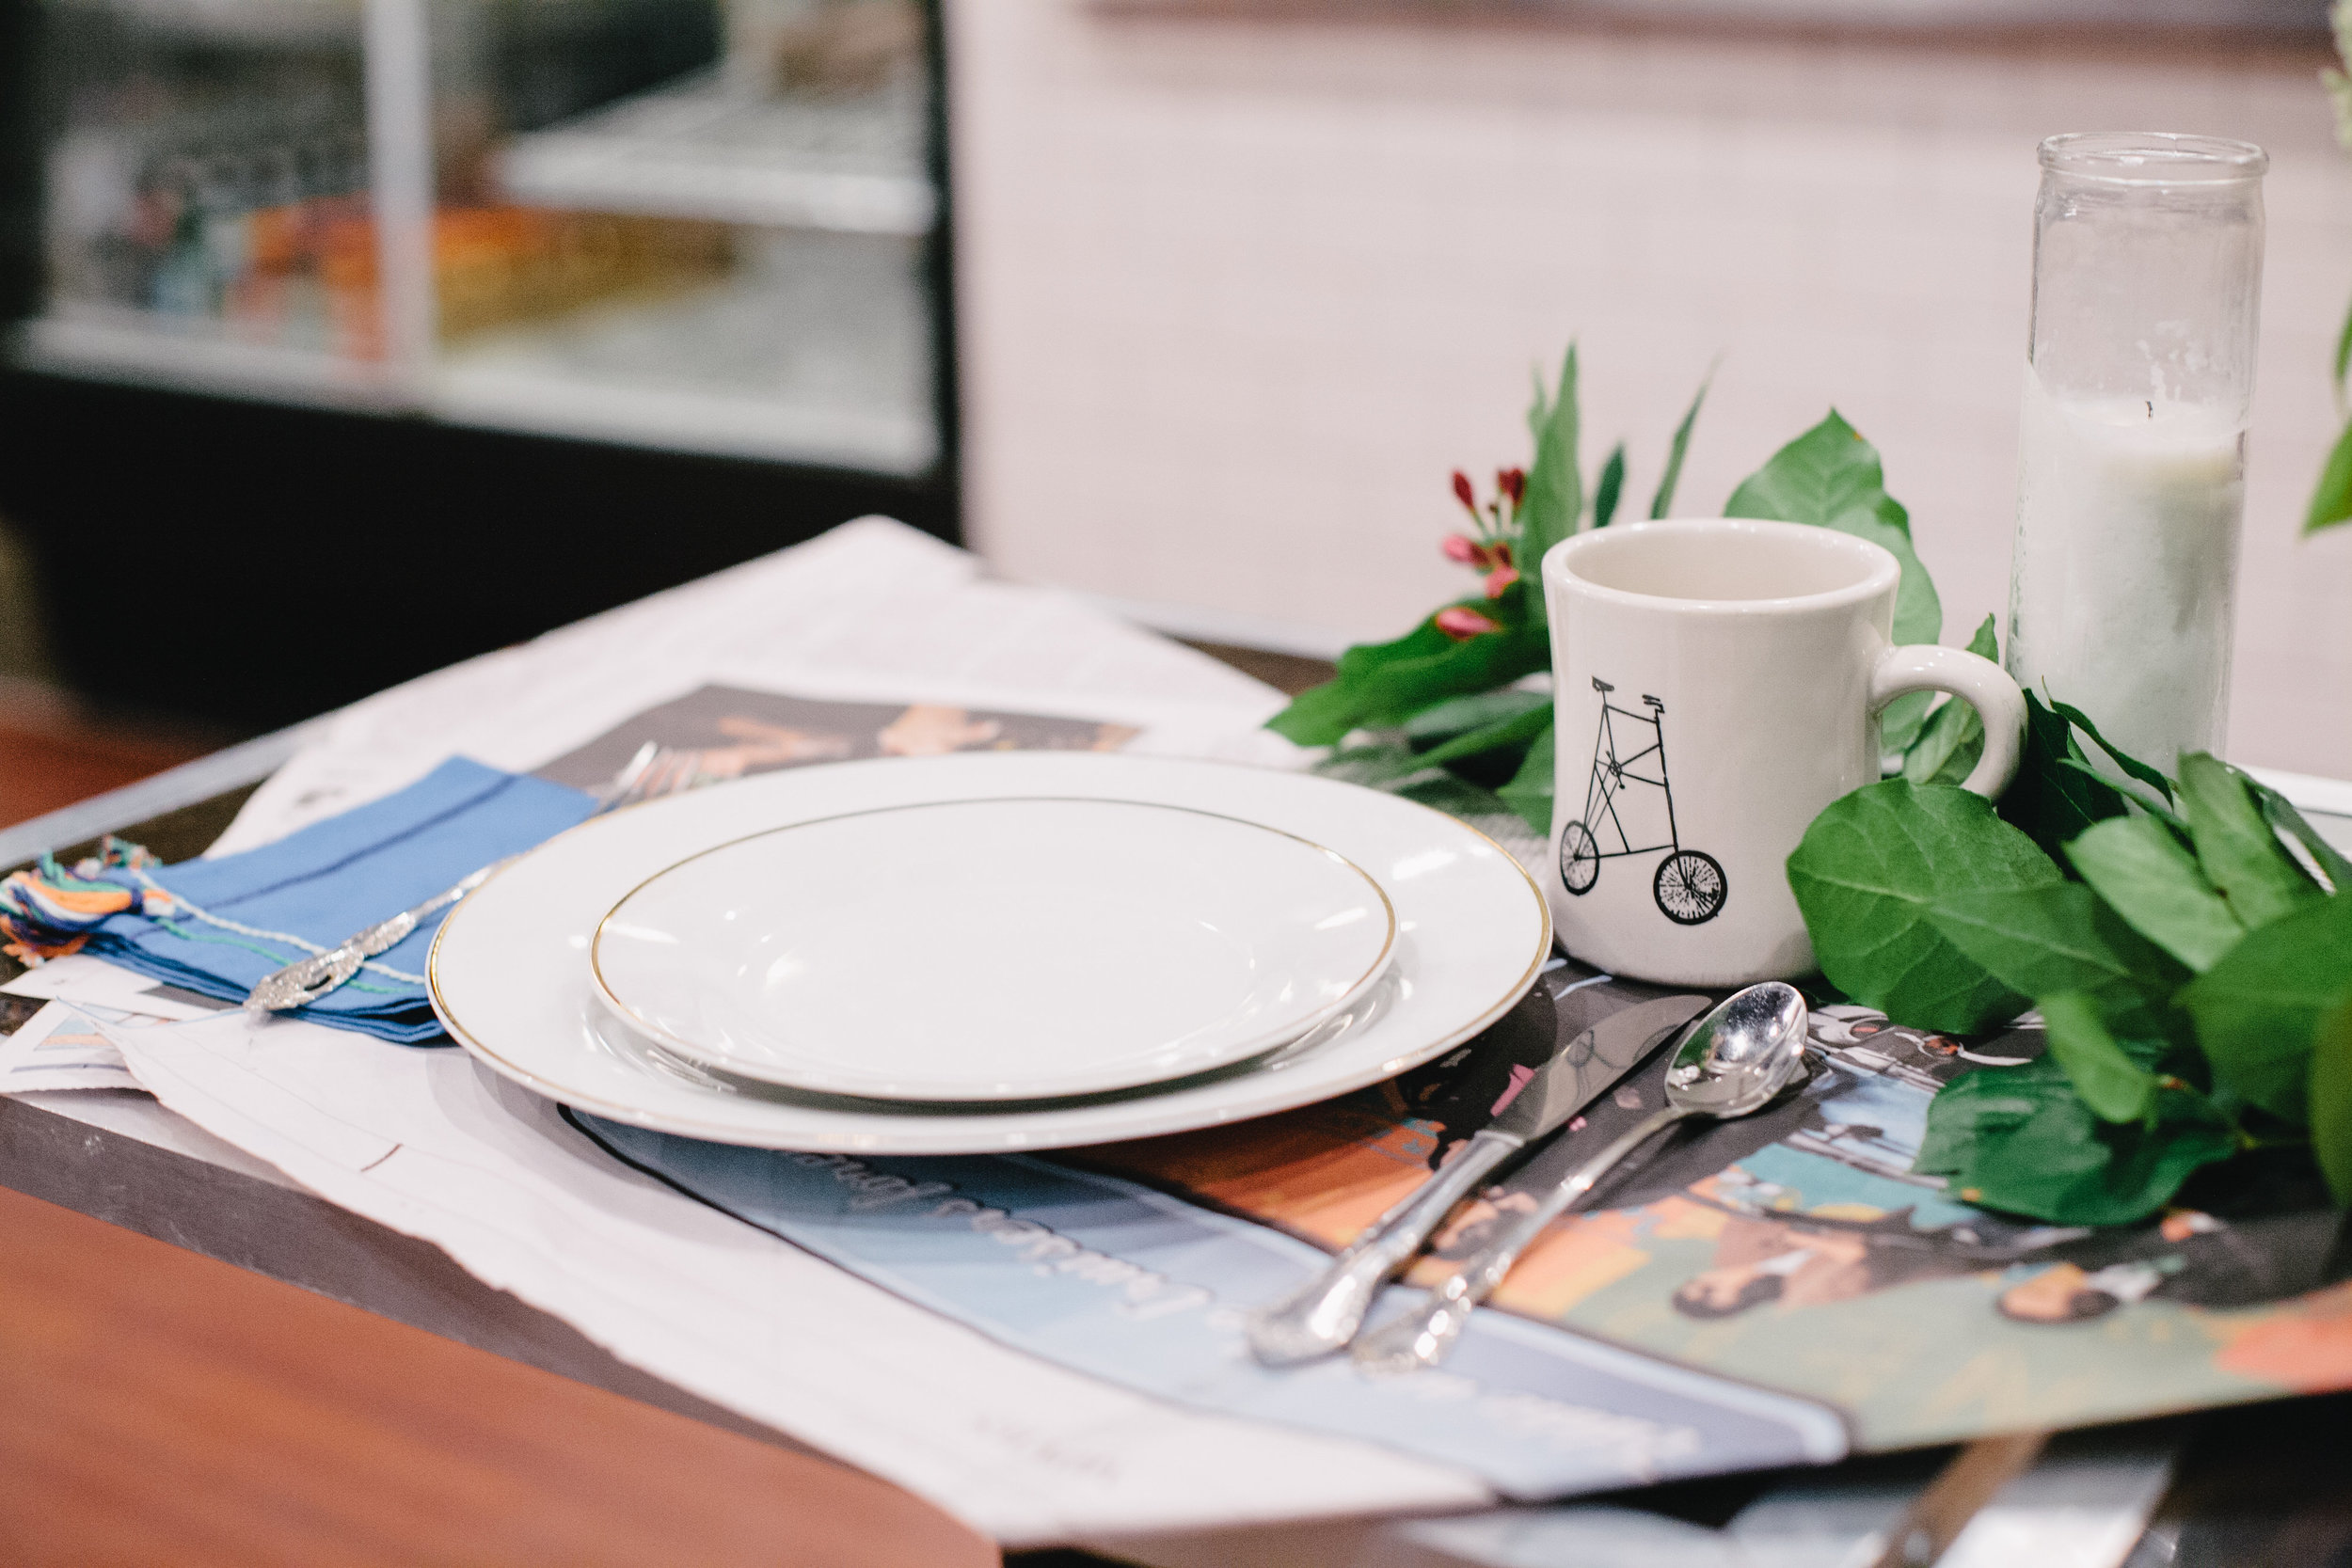 jop_styleshoot_weddingrabbit-0002.jpg